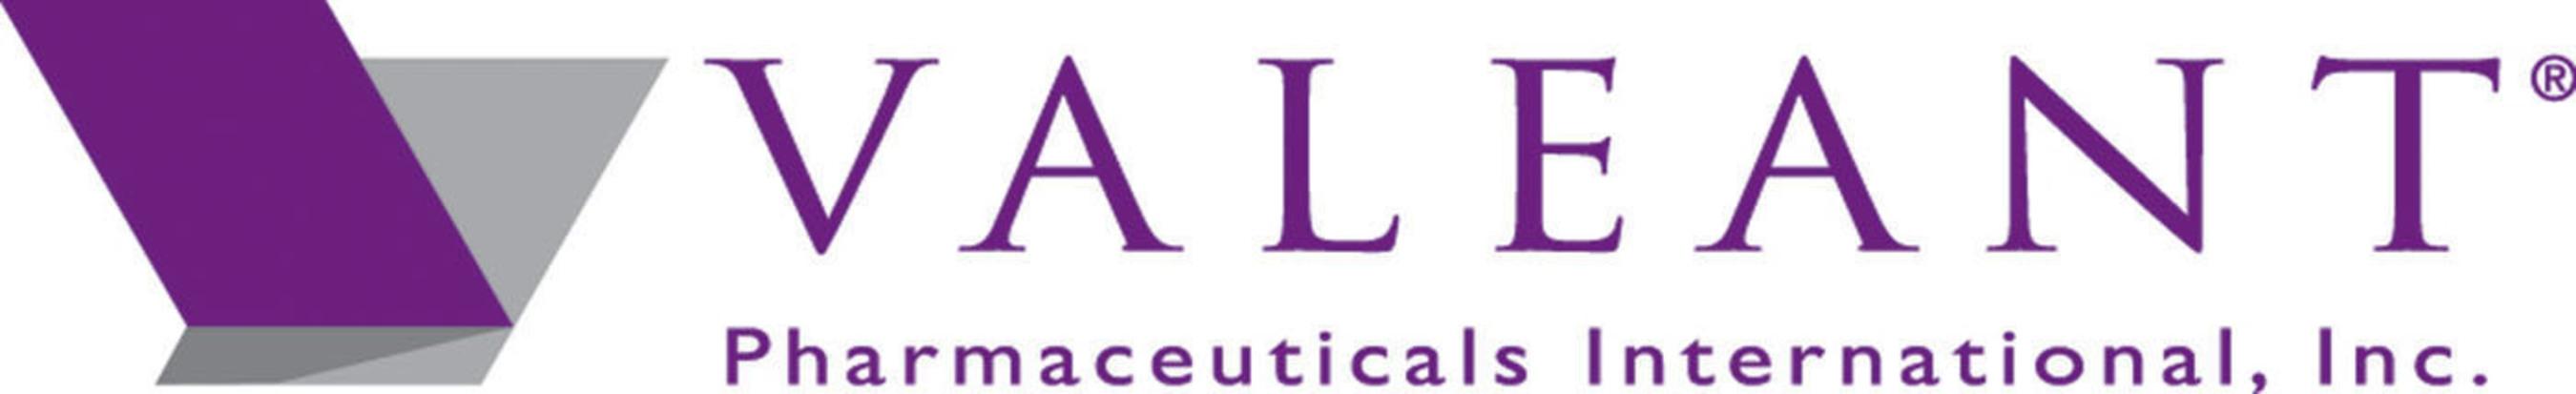 Valeant Pharmaceuticals International, Inc.